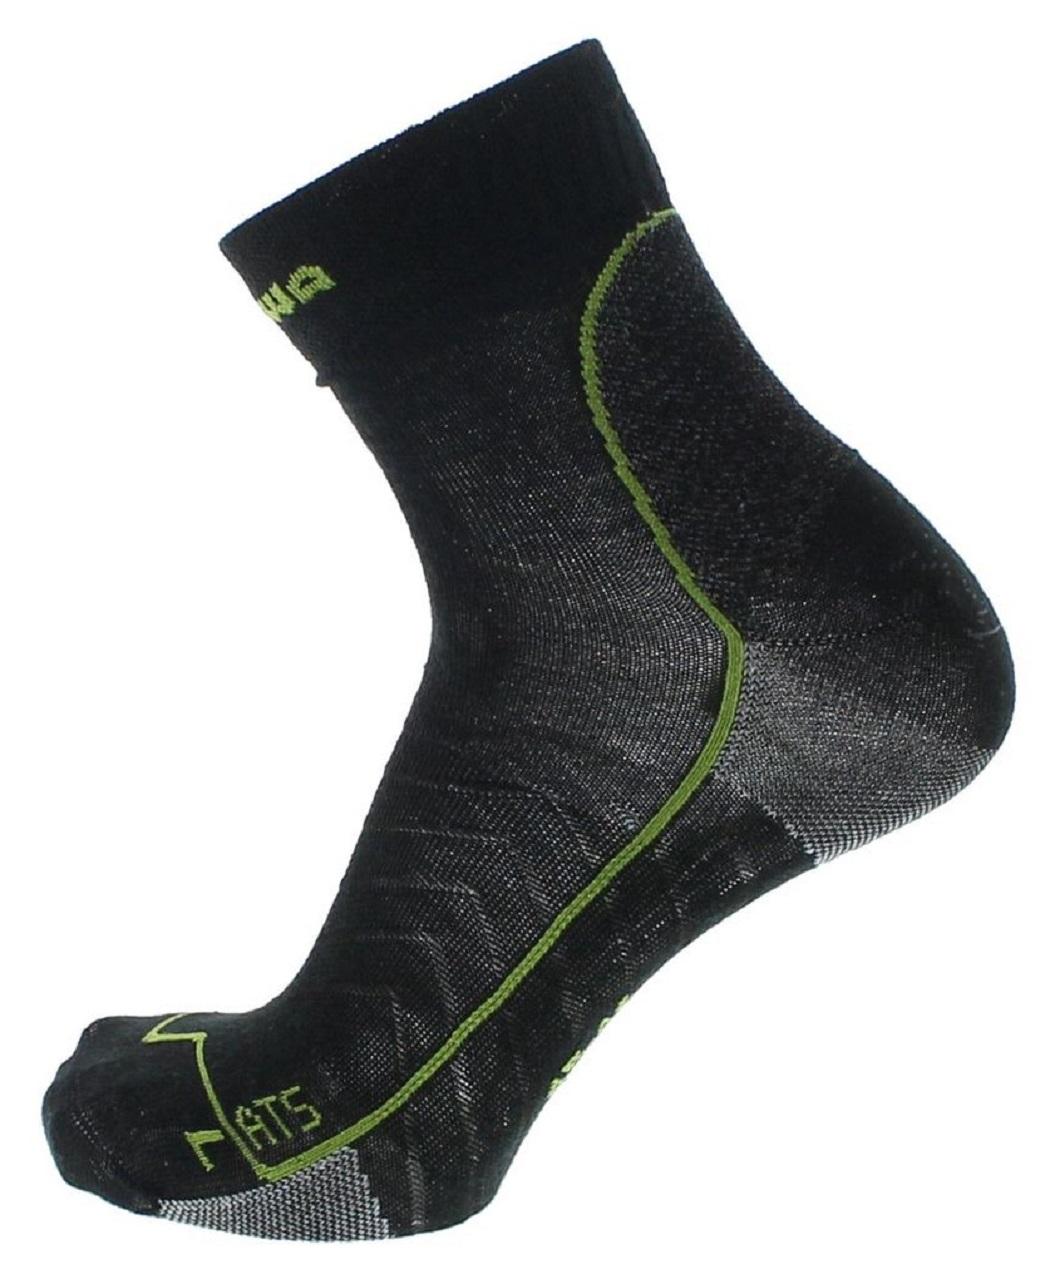 Lowa ALL TERRAIN SPORT SOCKE Schwarz Unisex Socken günstig online kaufen